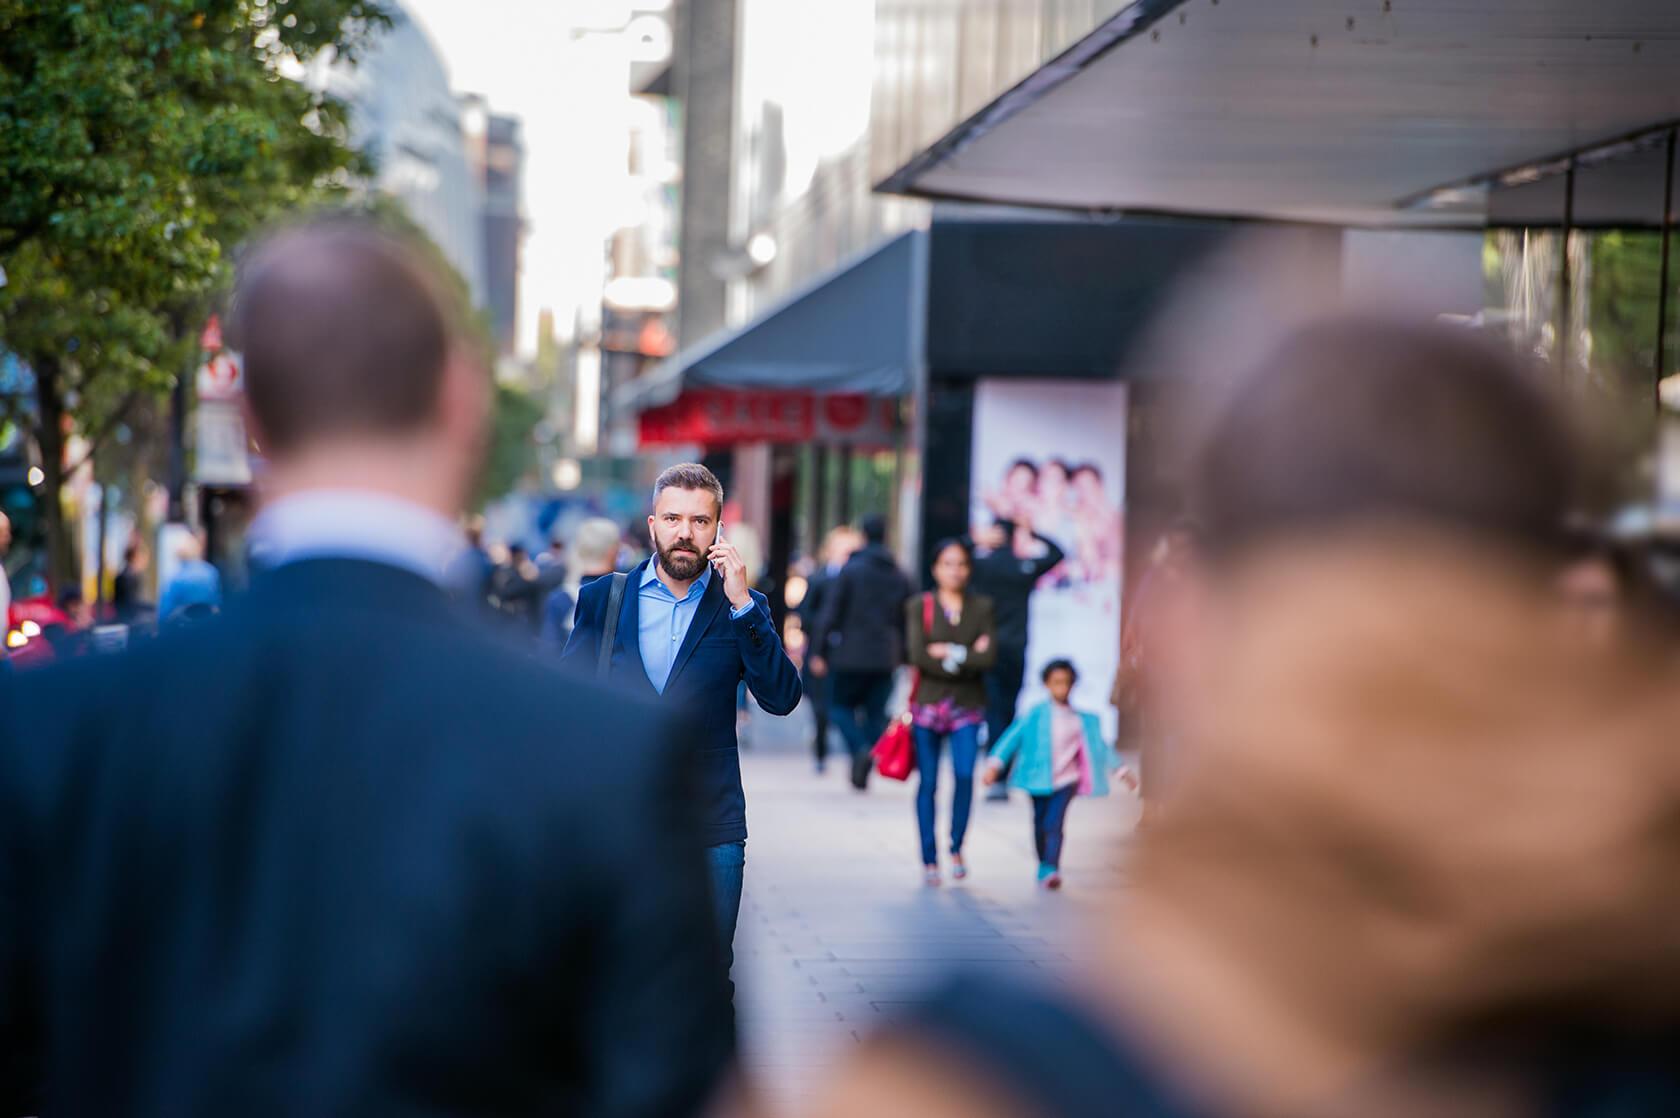 hipster manager with smart phone walking in the PFKTPR91 - روش های راه اندازی یک شرکت تجاری